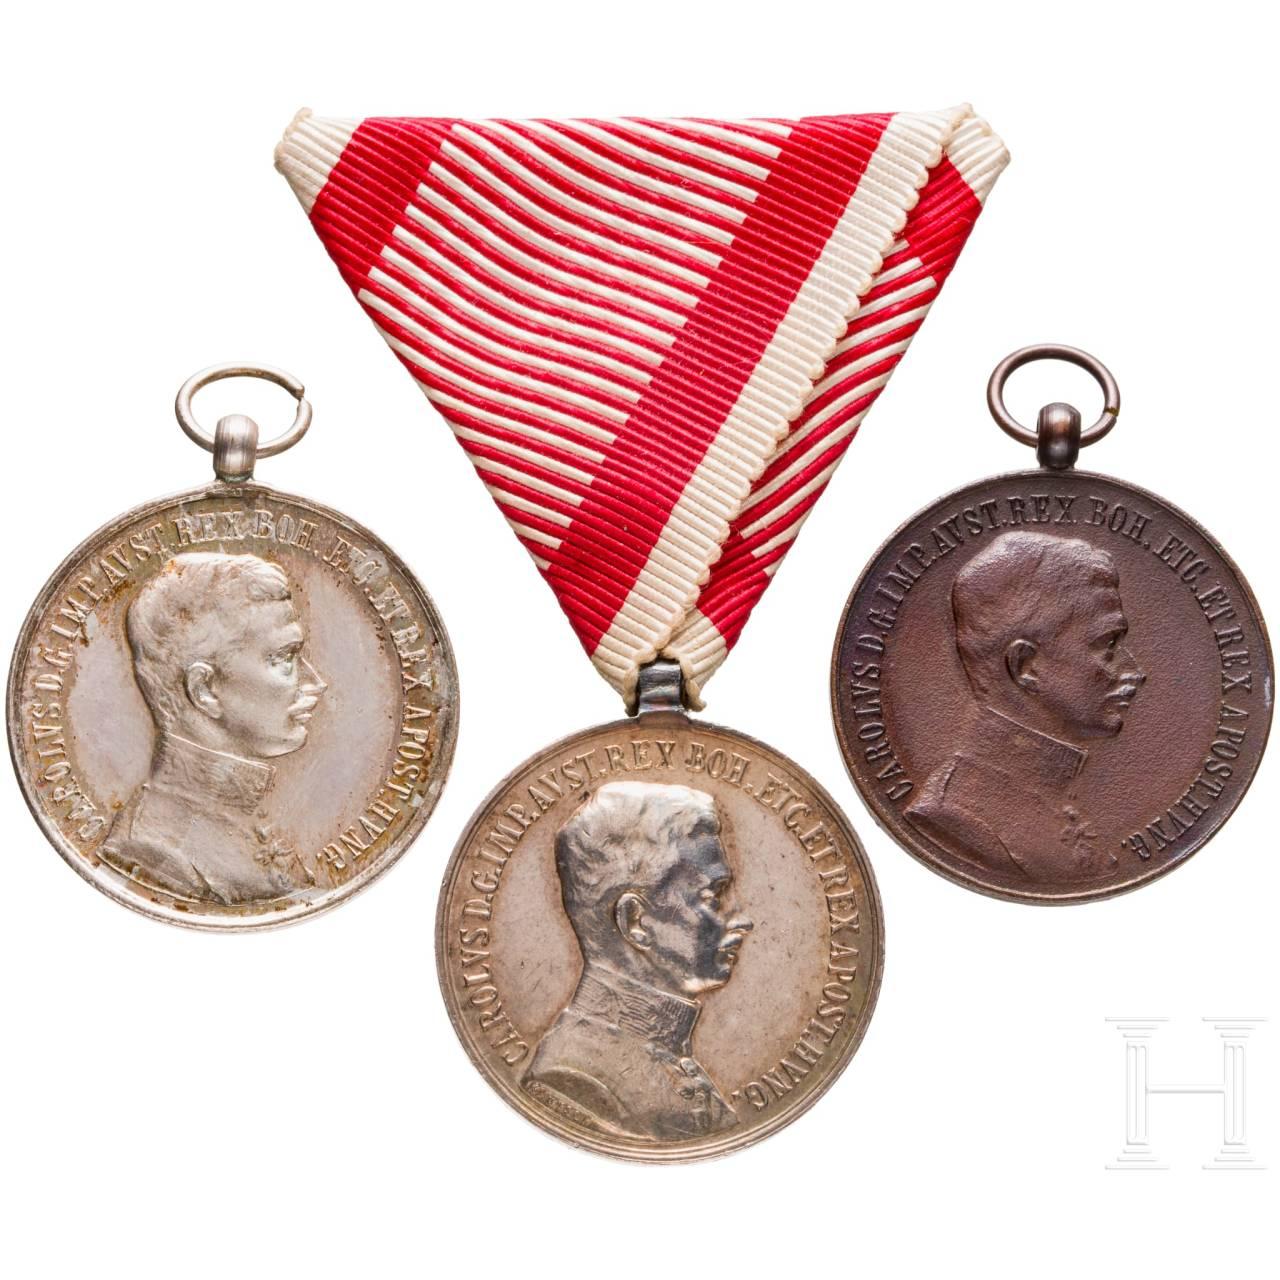 Medal of Bravery - three awards